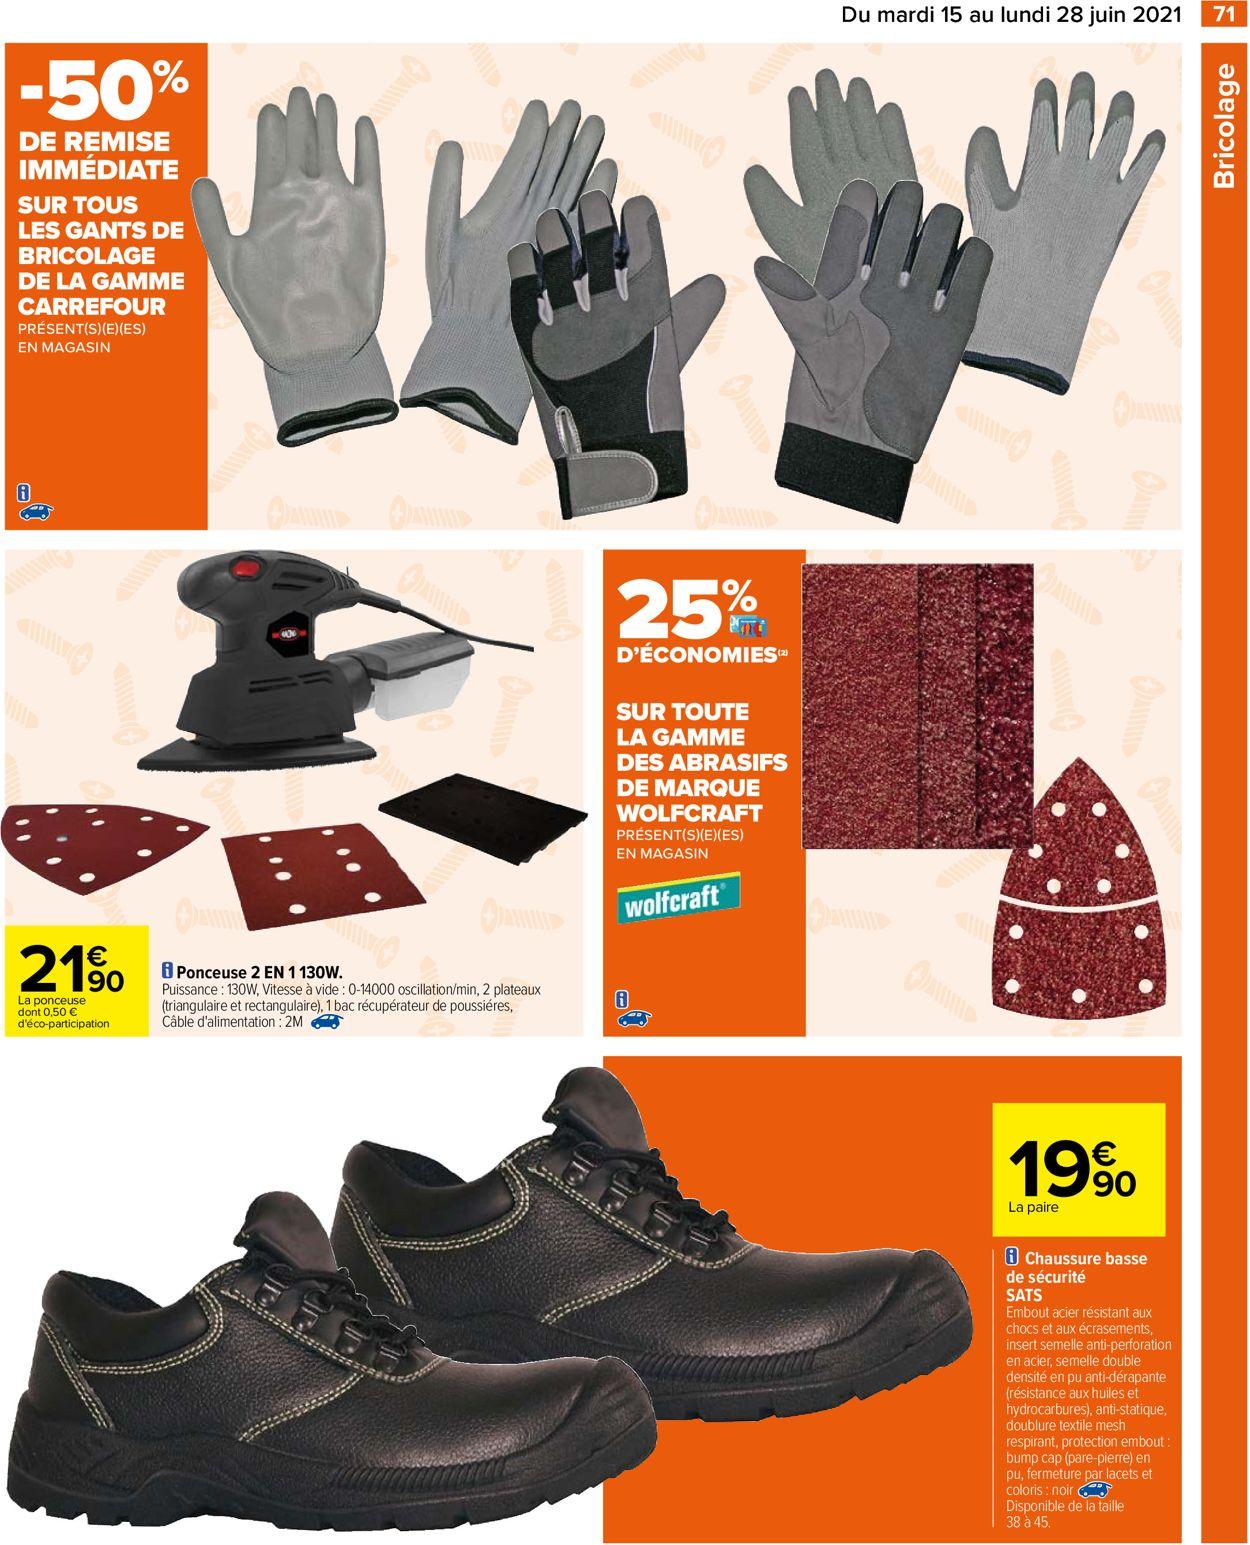 Carrefour Catalogue - 15.06-28.06.2021 (Page 76)